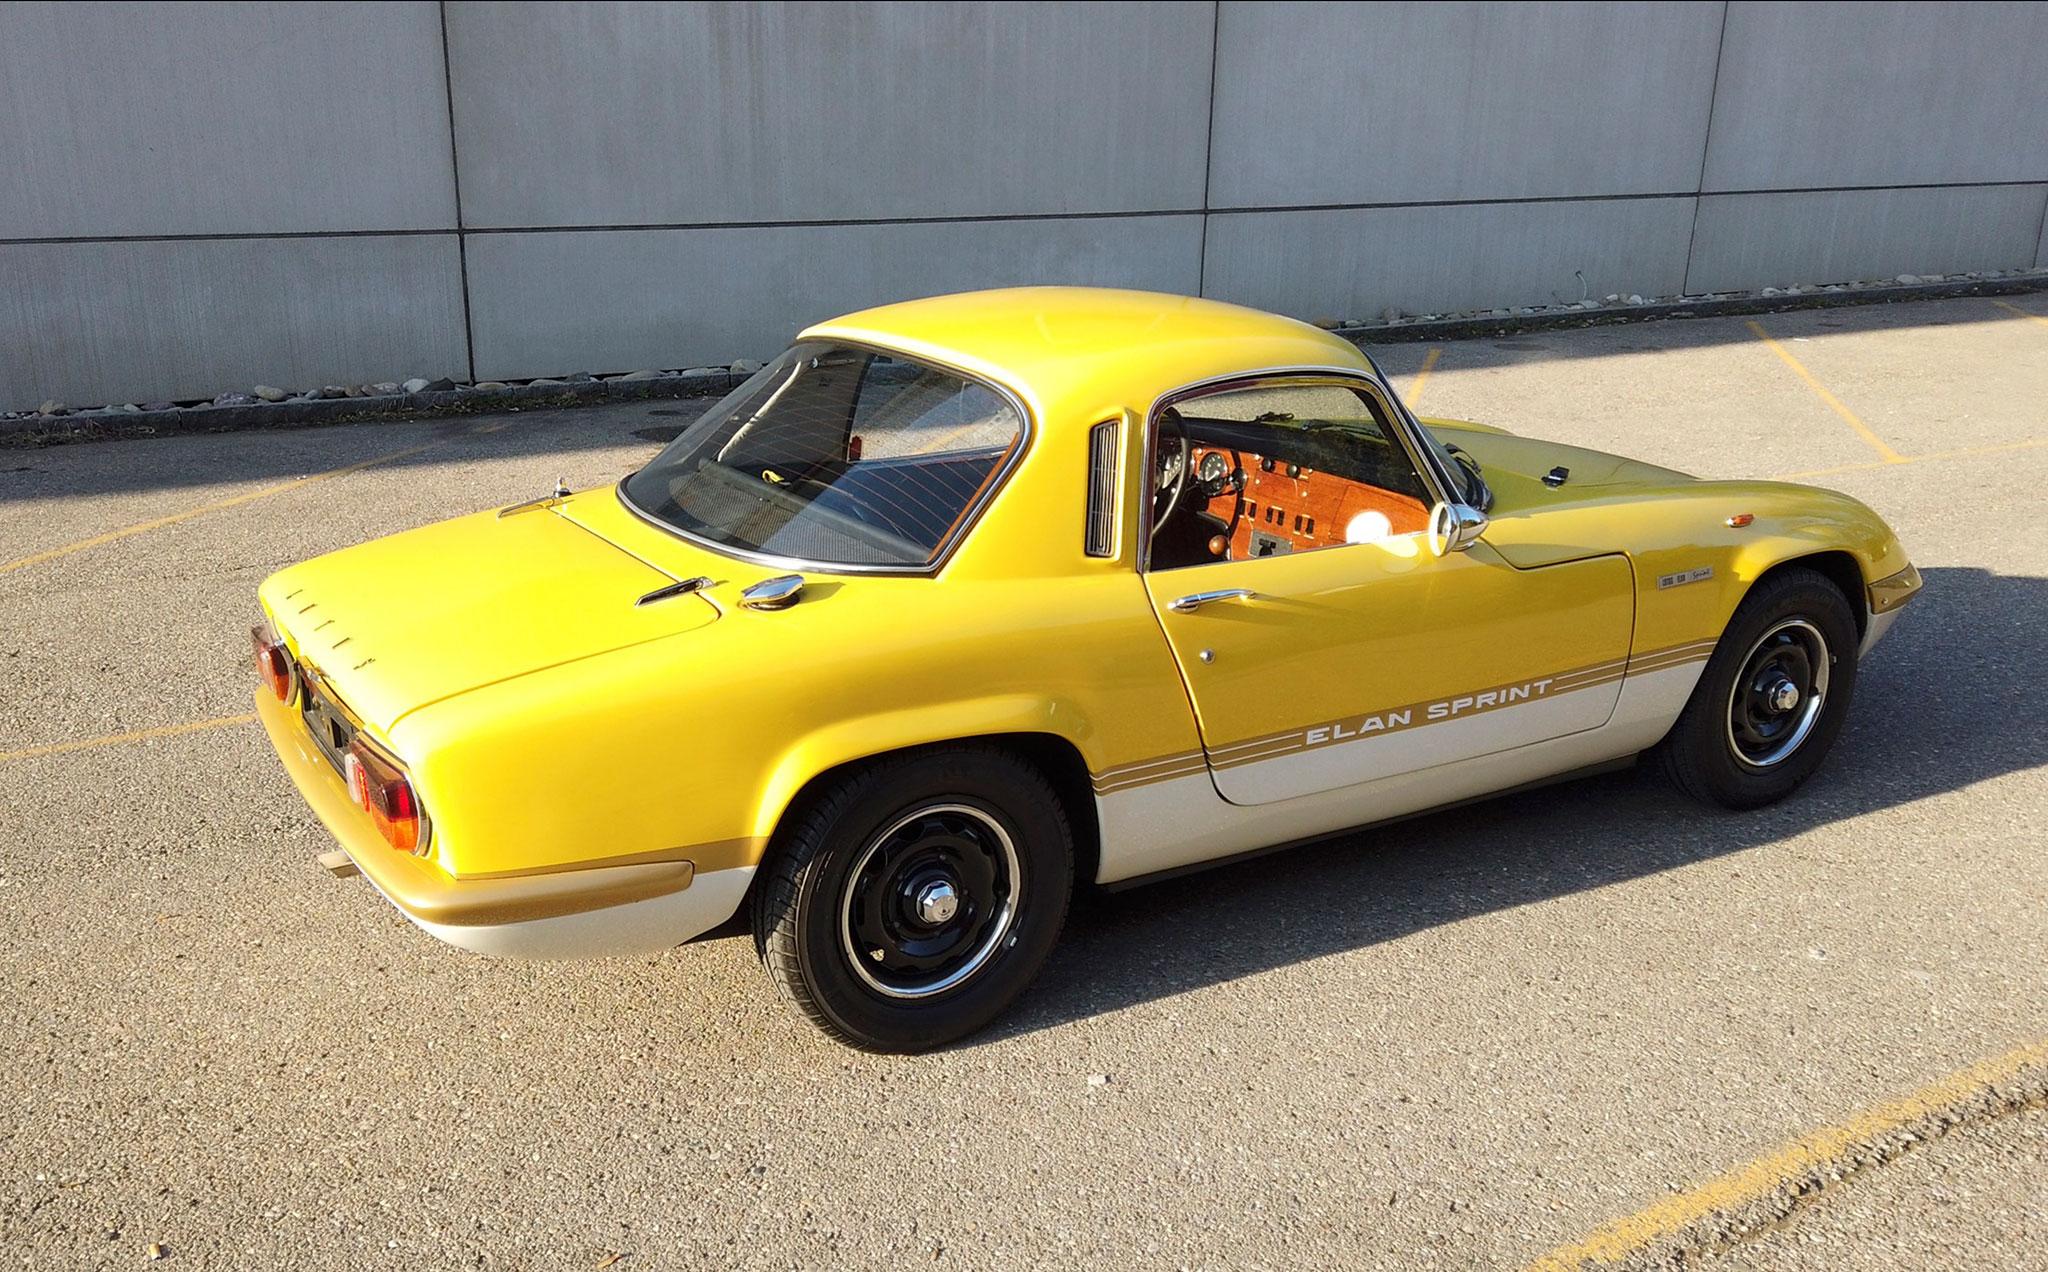 1971 Lotus Elan Sprint Coupé CHF 67 700.